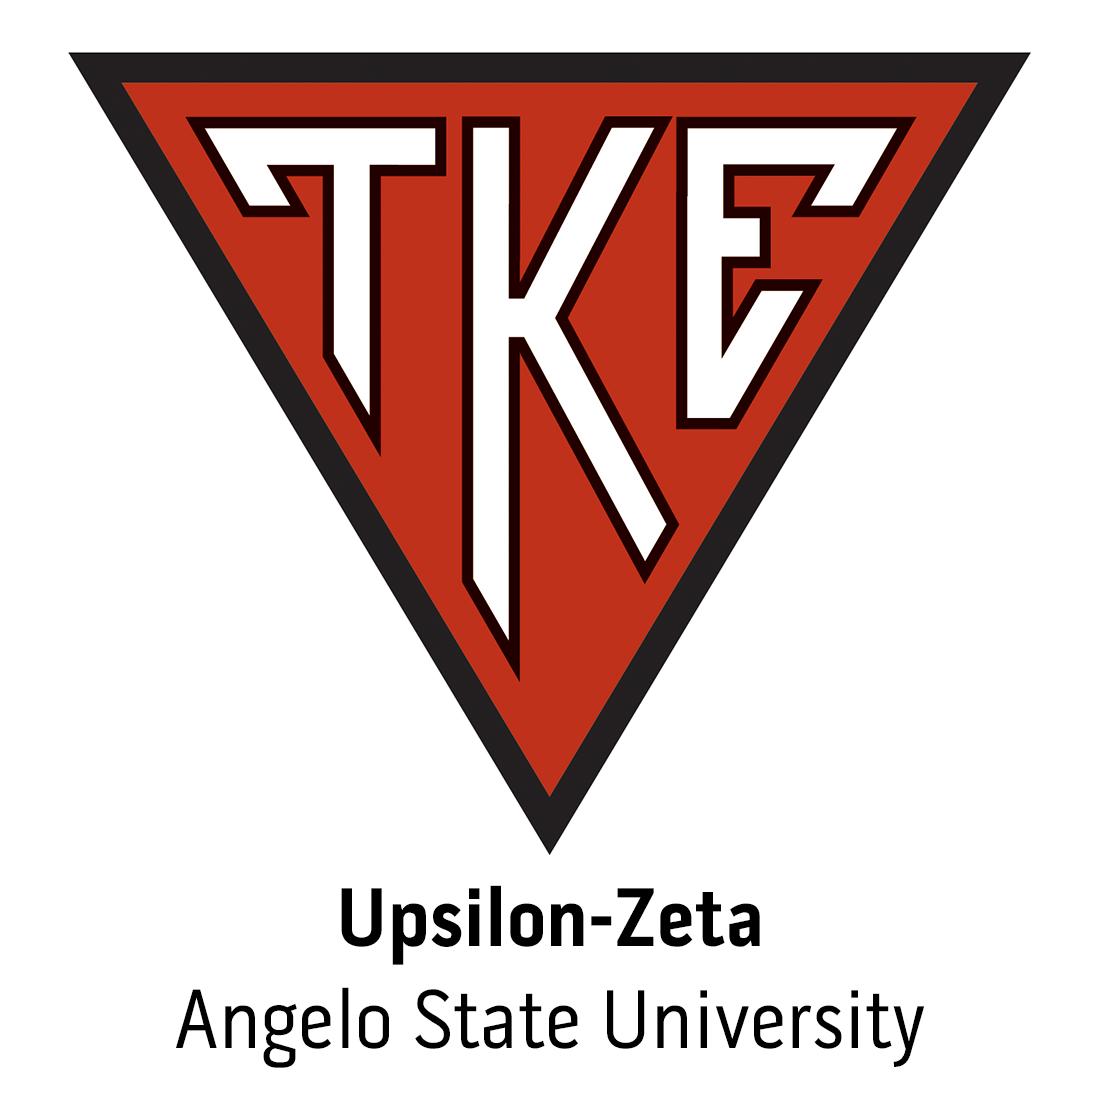 Upsilon-Zeta Chapter at Angelo State University